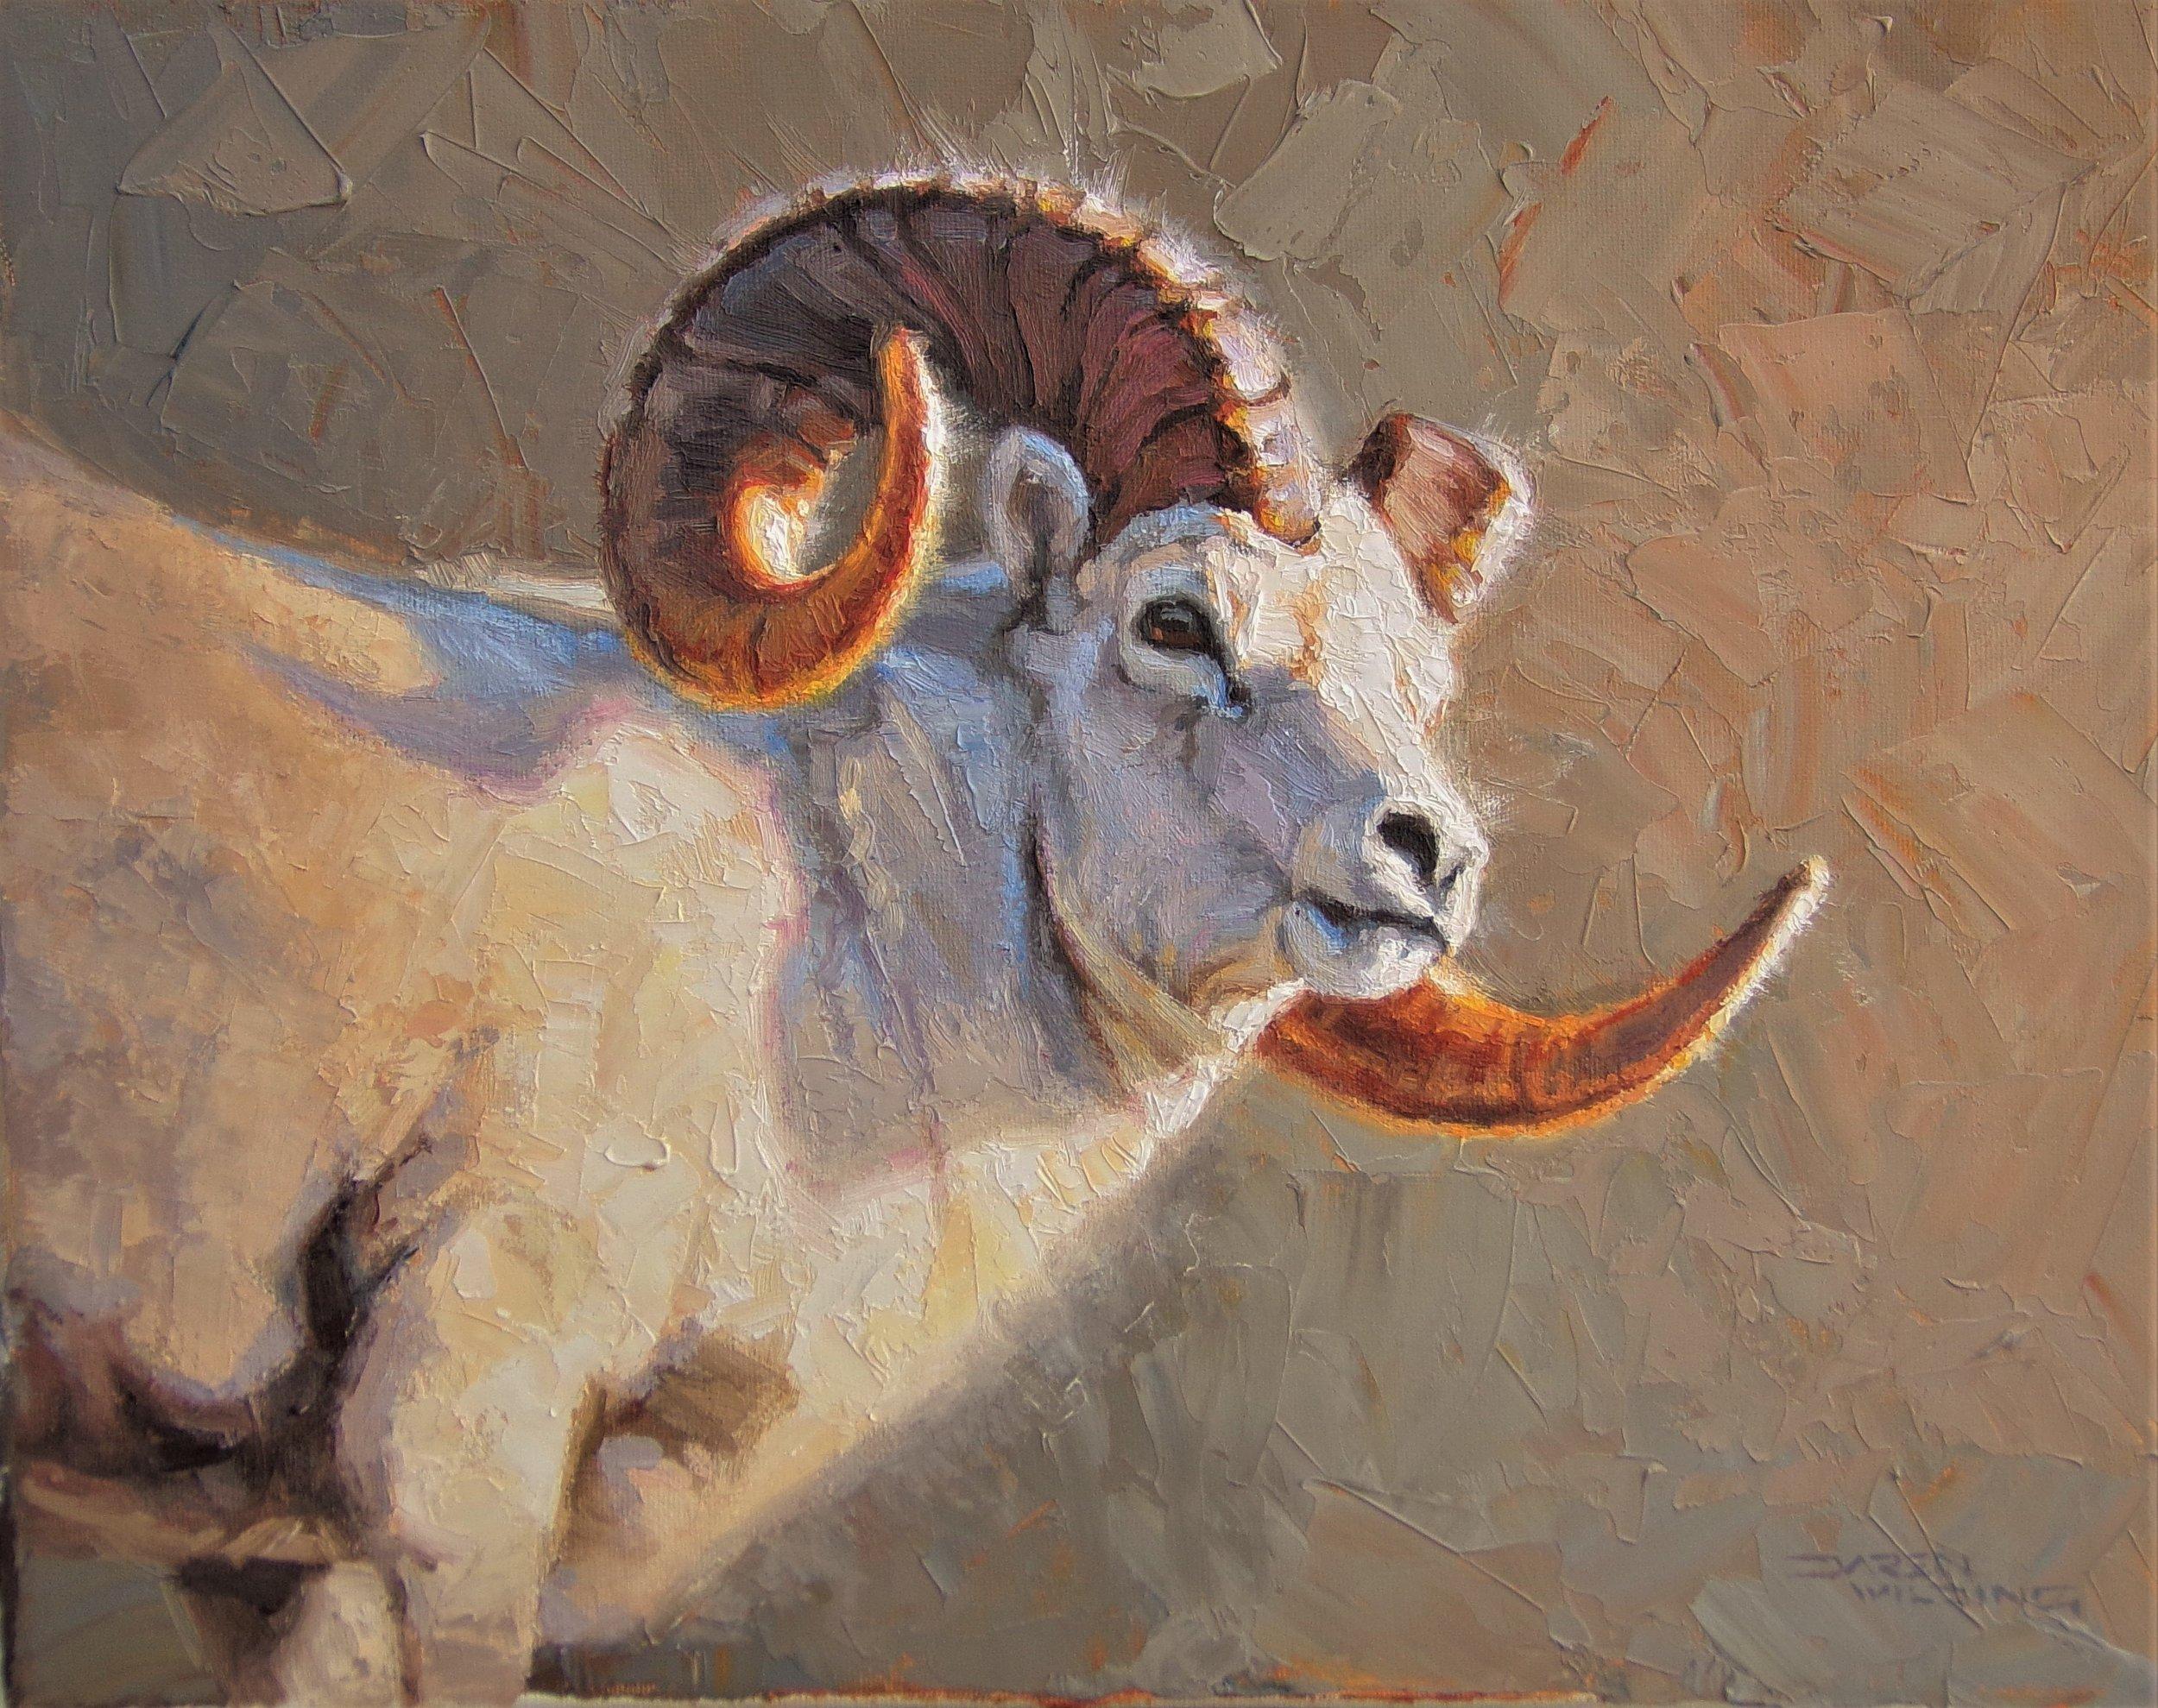 """Alaska Gold"" - 11x14"" oil on canvas"